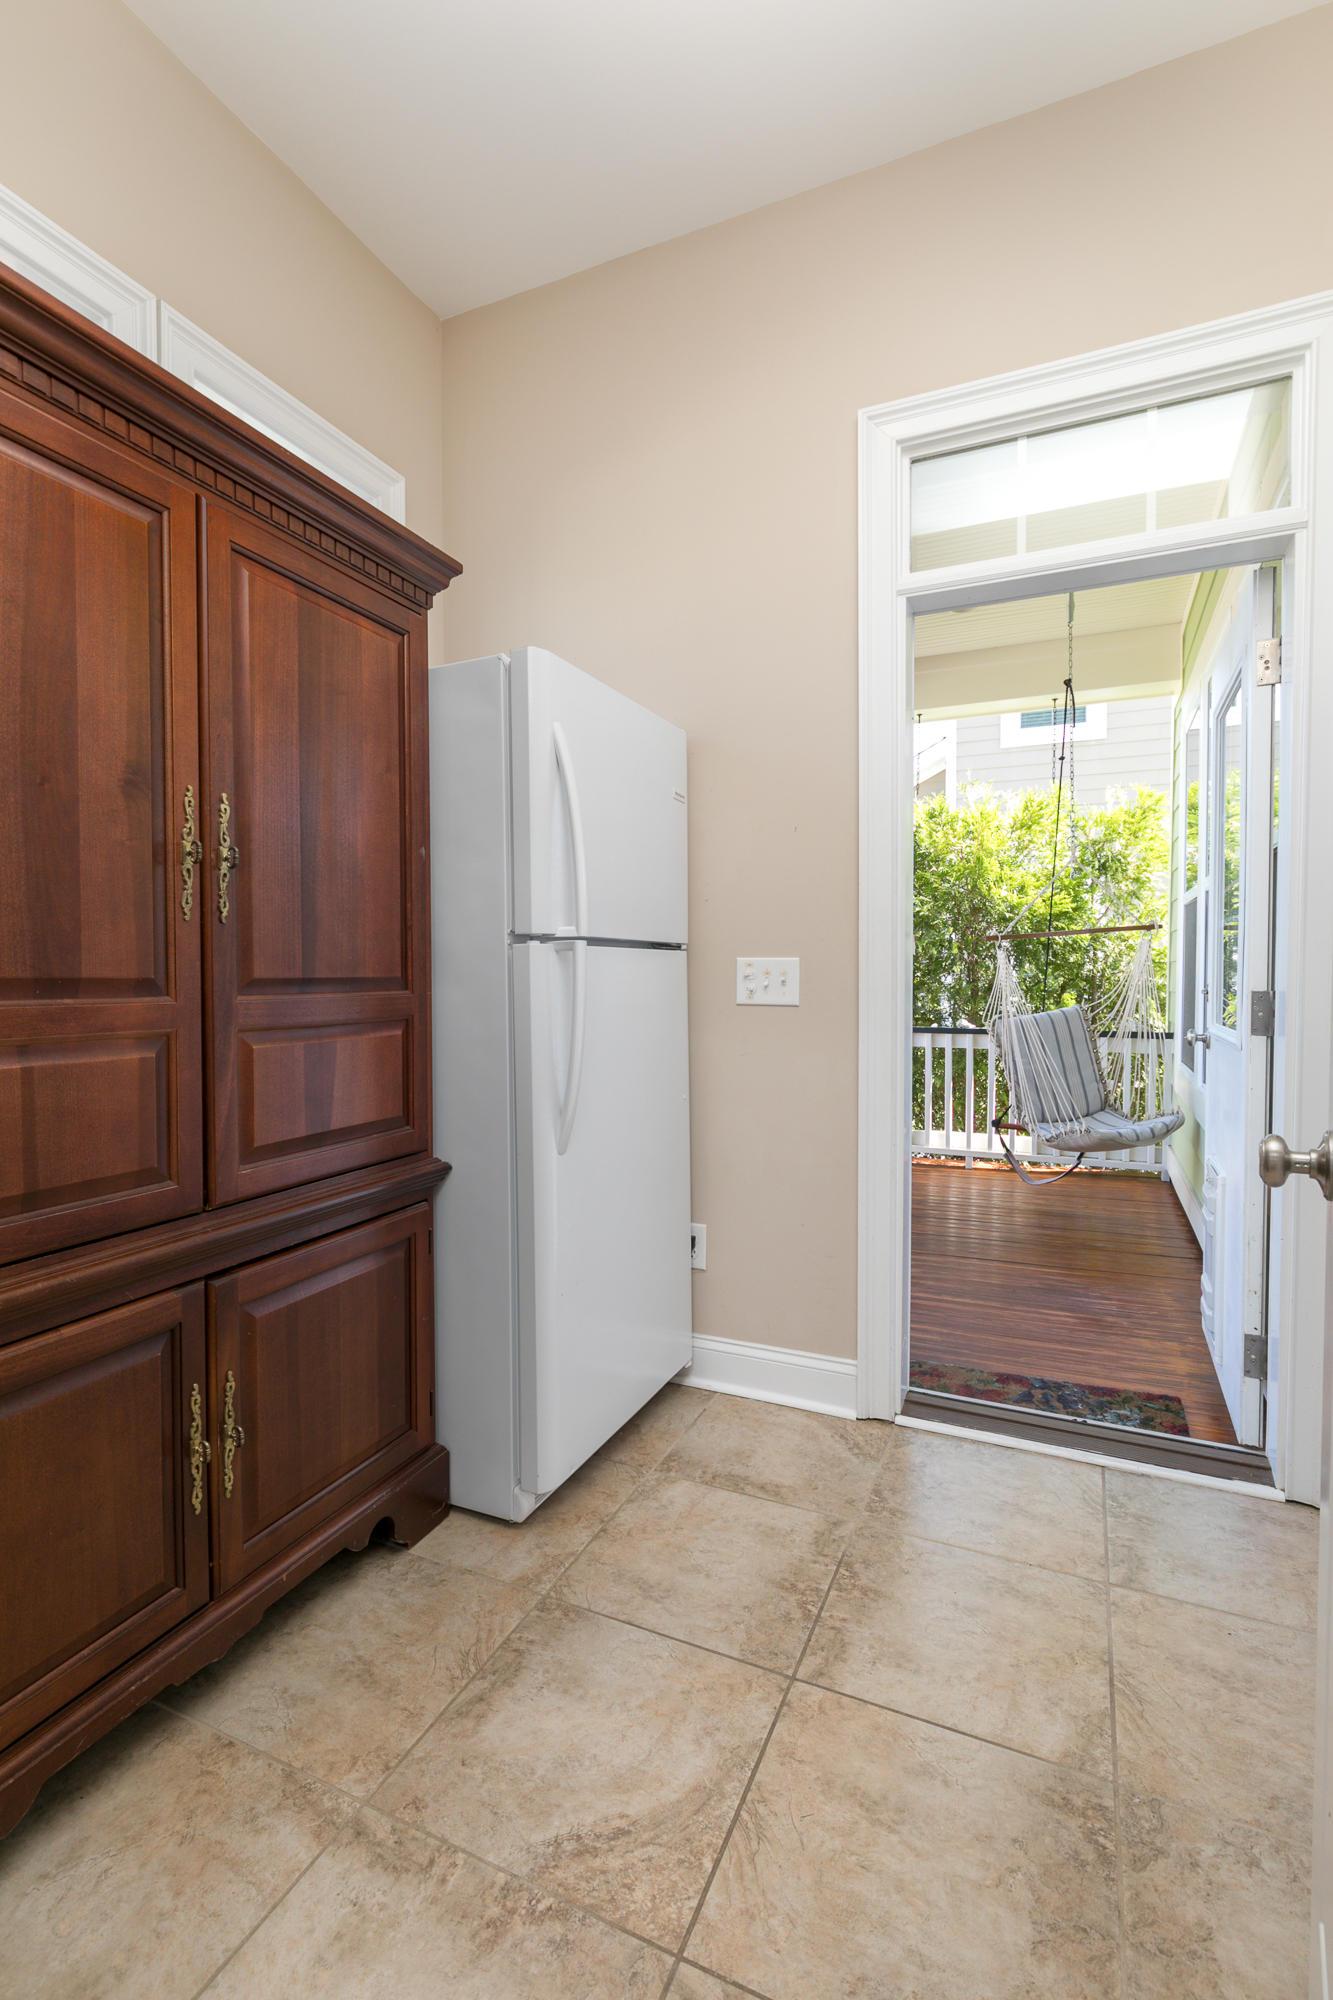 Carolina Park Homes For Sale - 1472 Croaton, Mount Pleasant, SC - 8